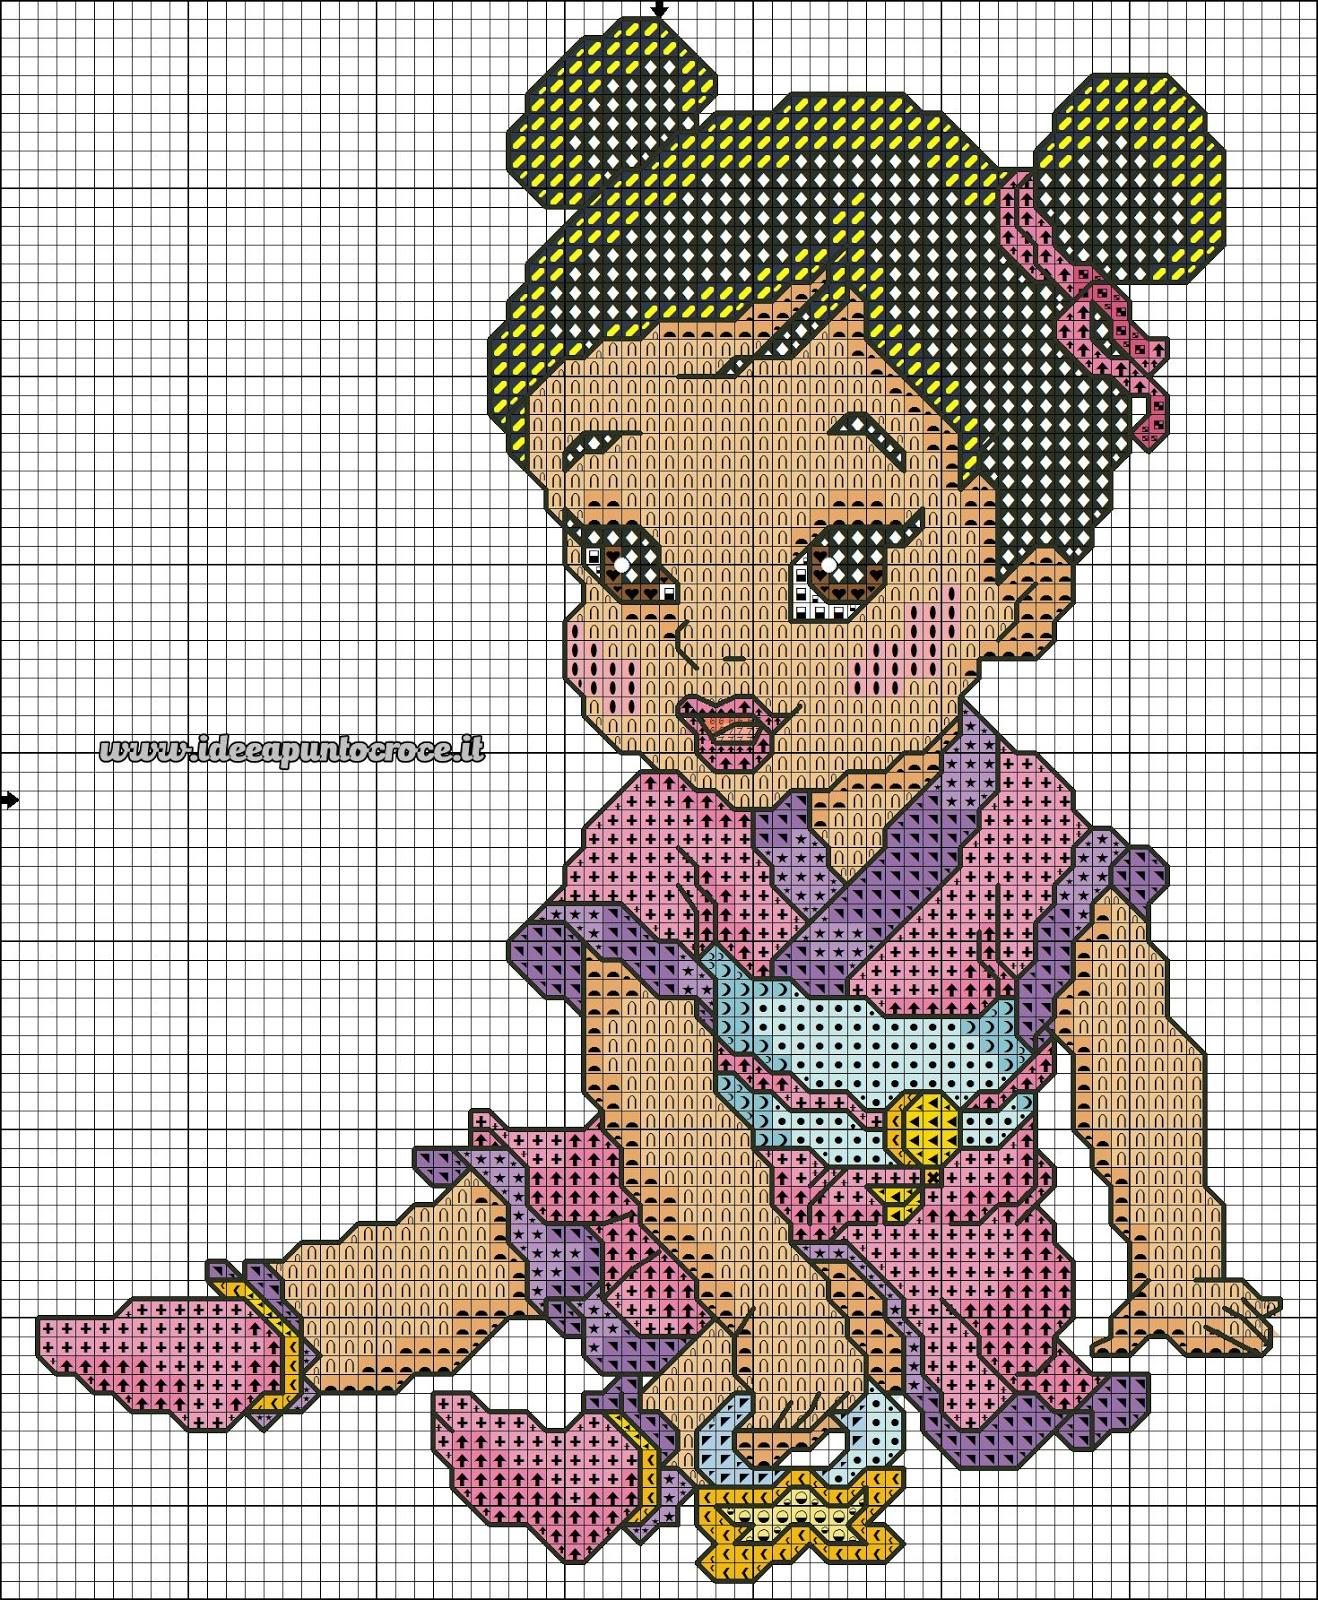 Schemi disney a punto croce schemi baby principesse disney for Disney punto croce schemi gratis